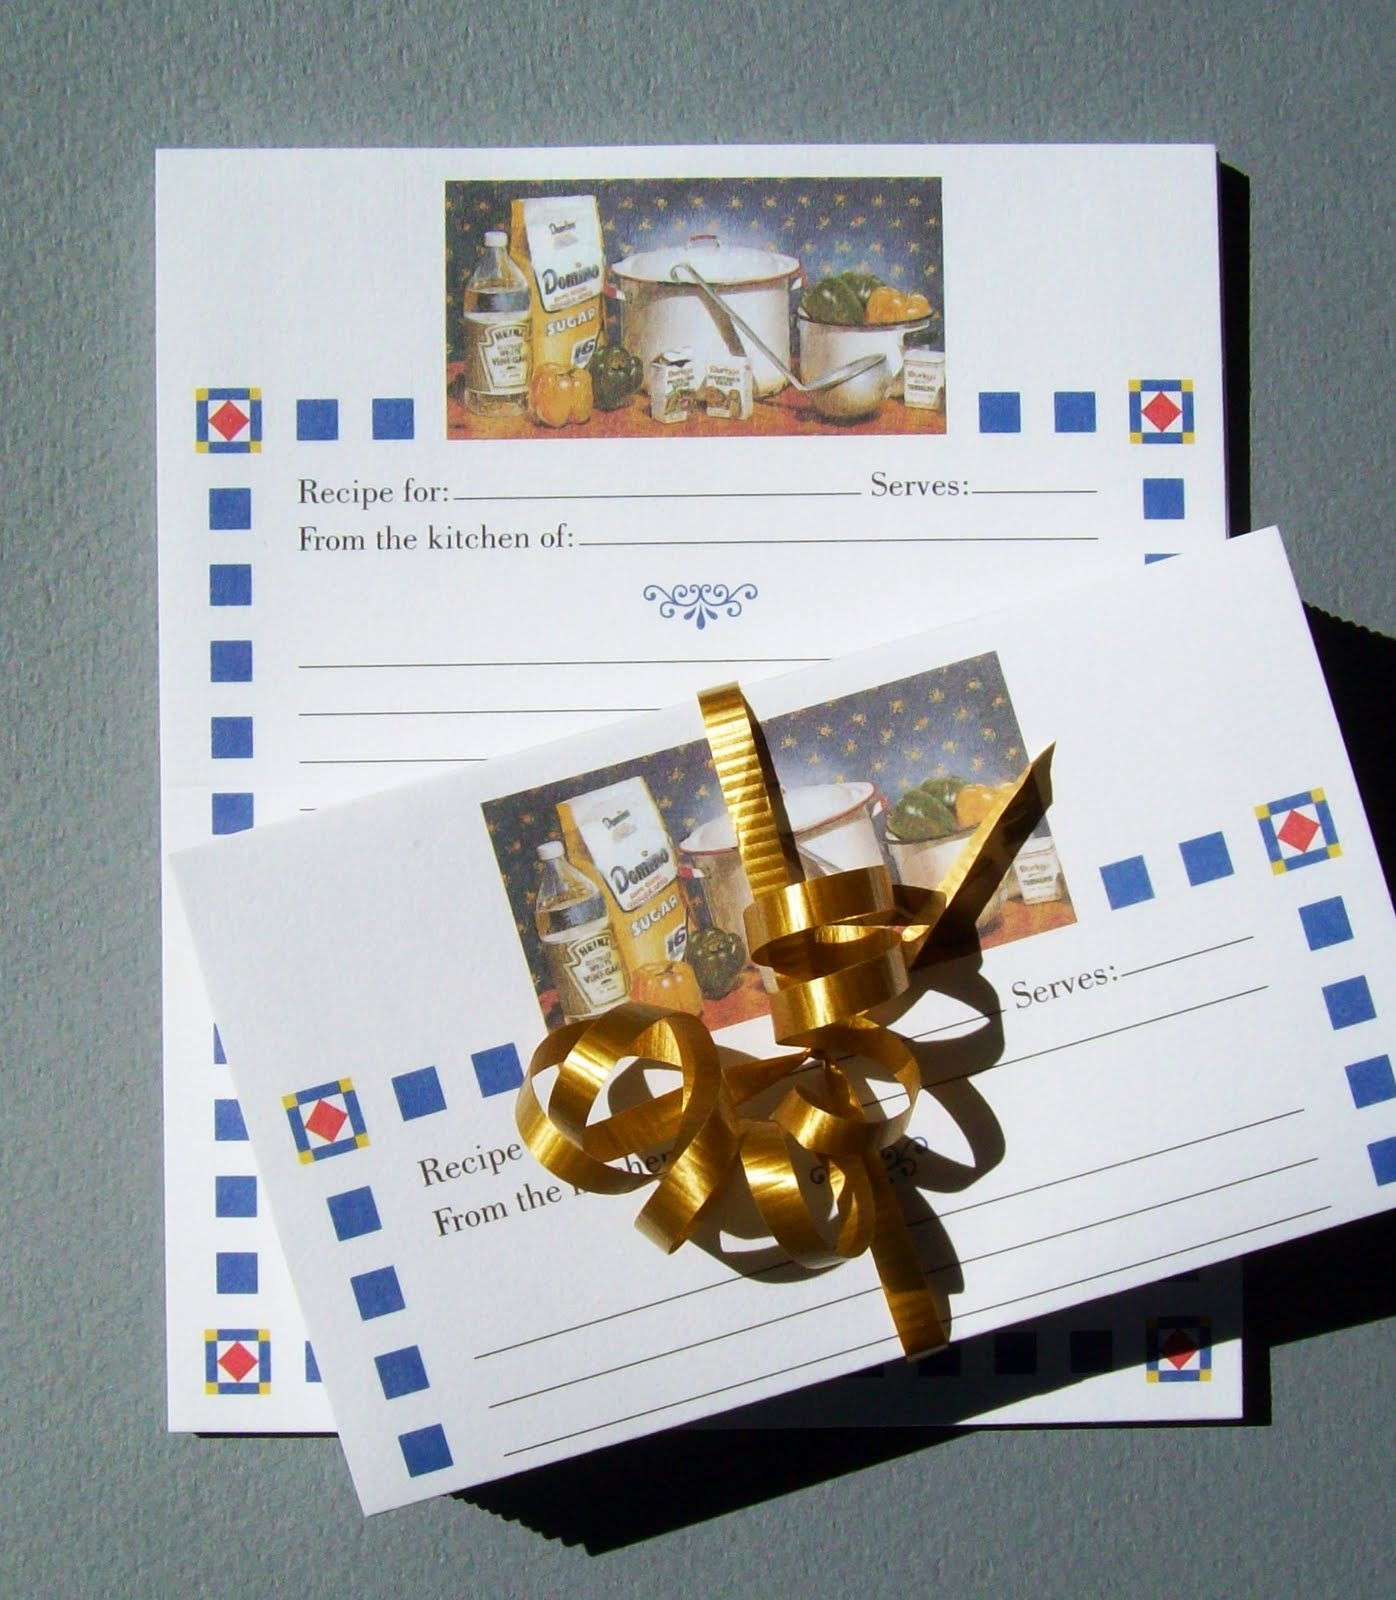 http://3.bp.blogspot.com/_qloo8ySvYTM/TKjc3bZ_7bI/AAAAAAAAIUE/BPbgeJ7mBuk/s1600/Peppers+Recipe+Cards.jpg